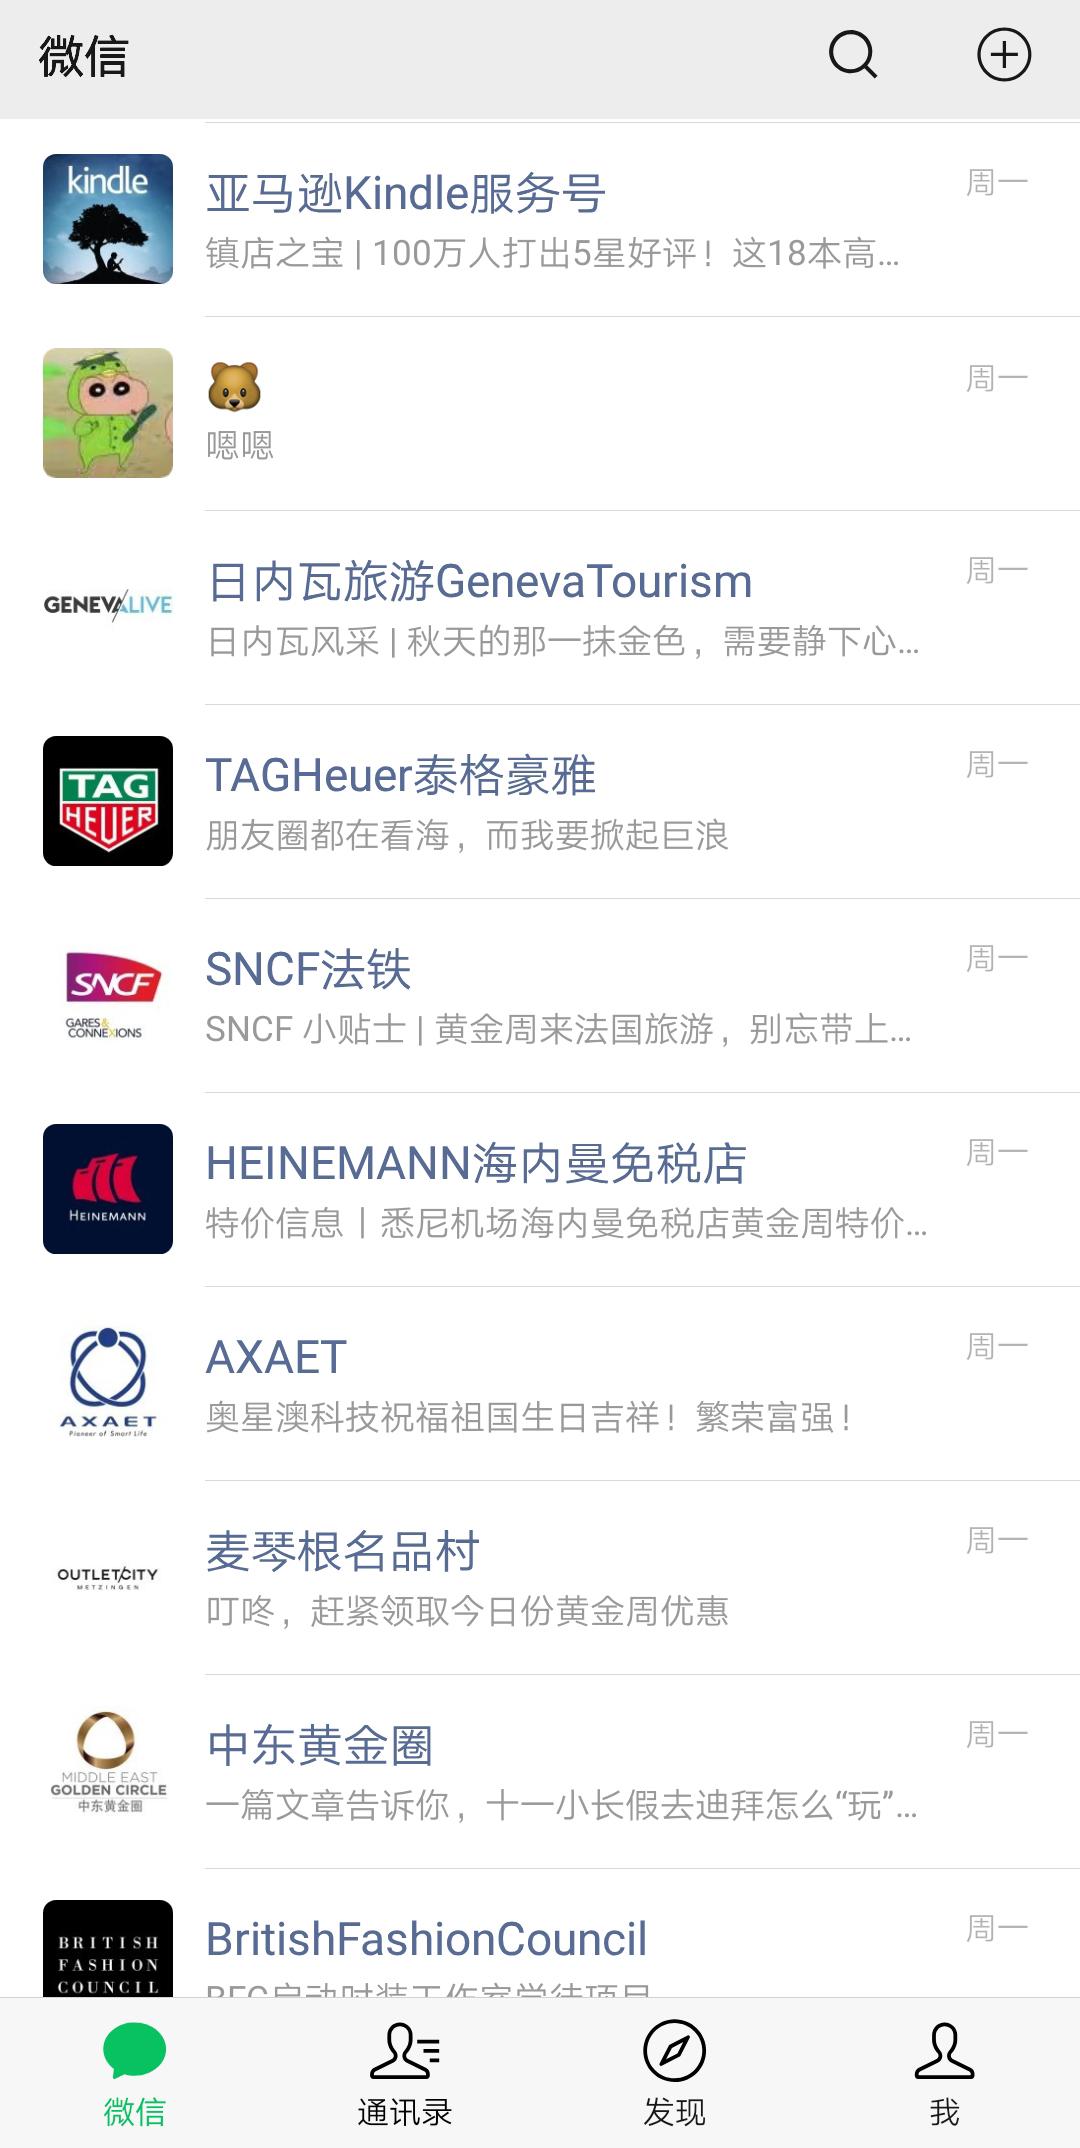 WeChat service account